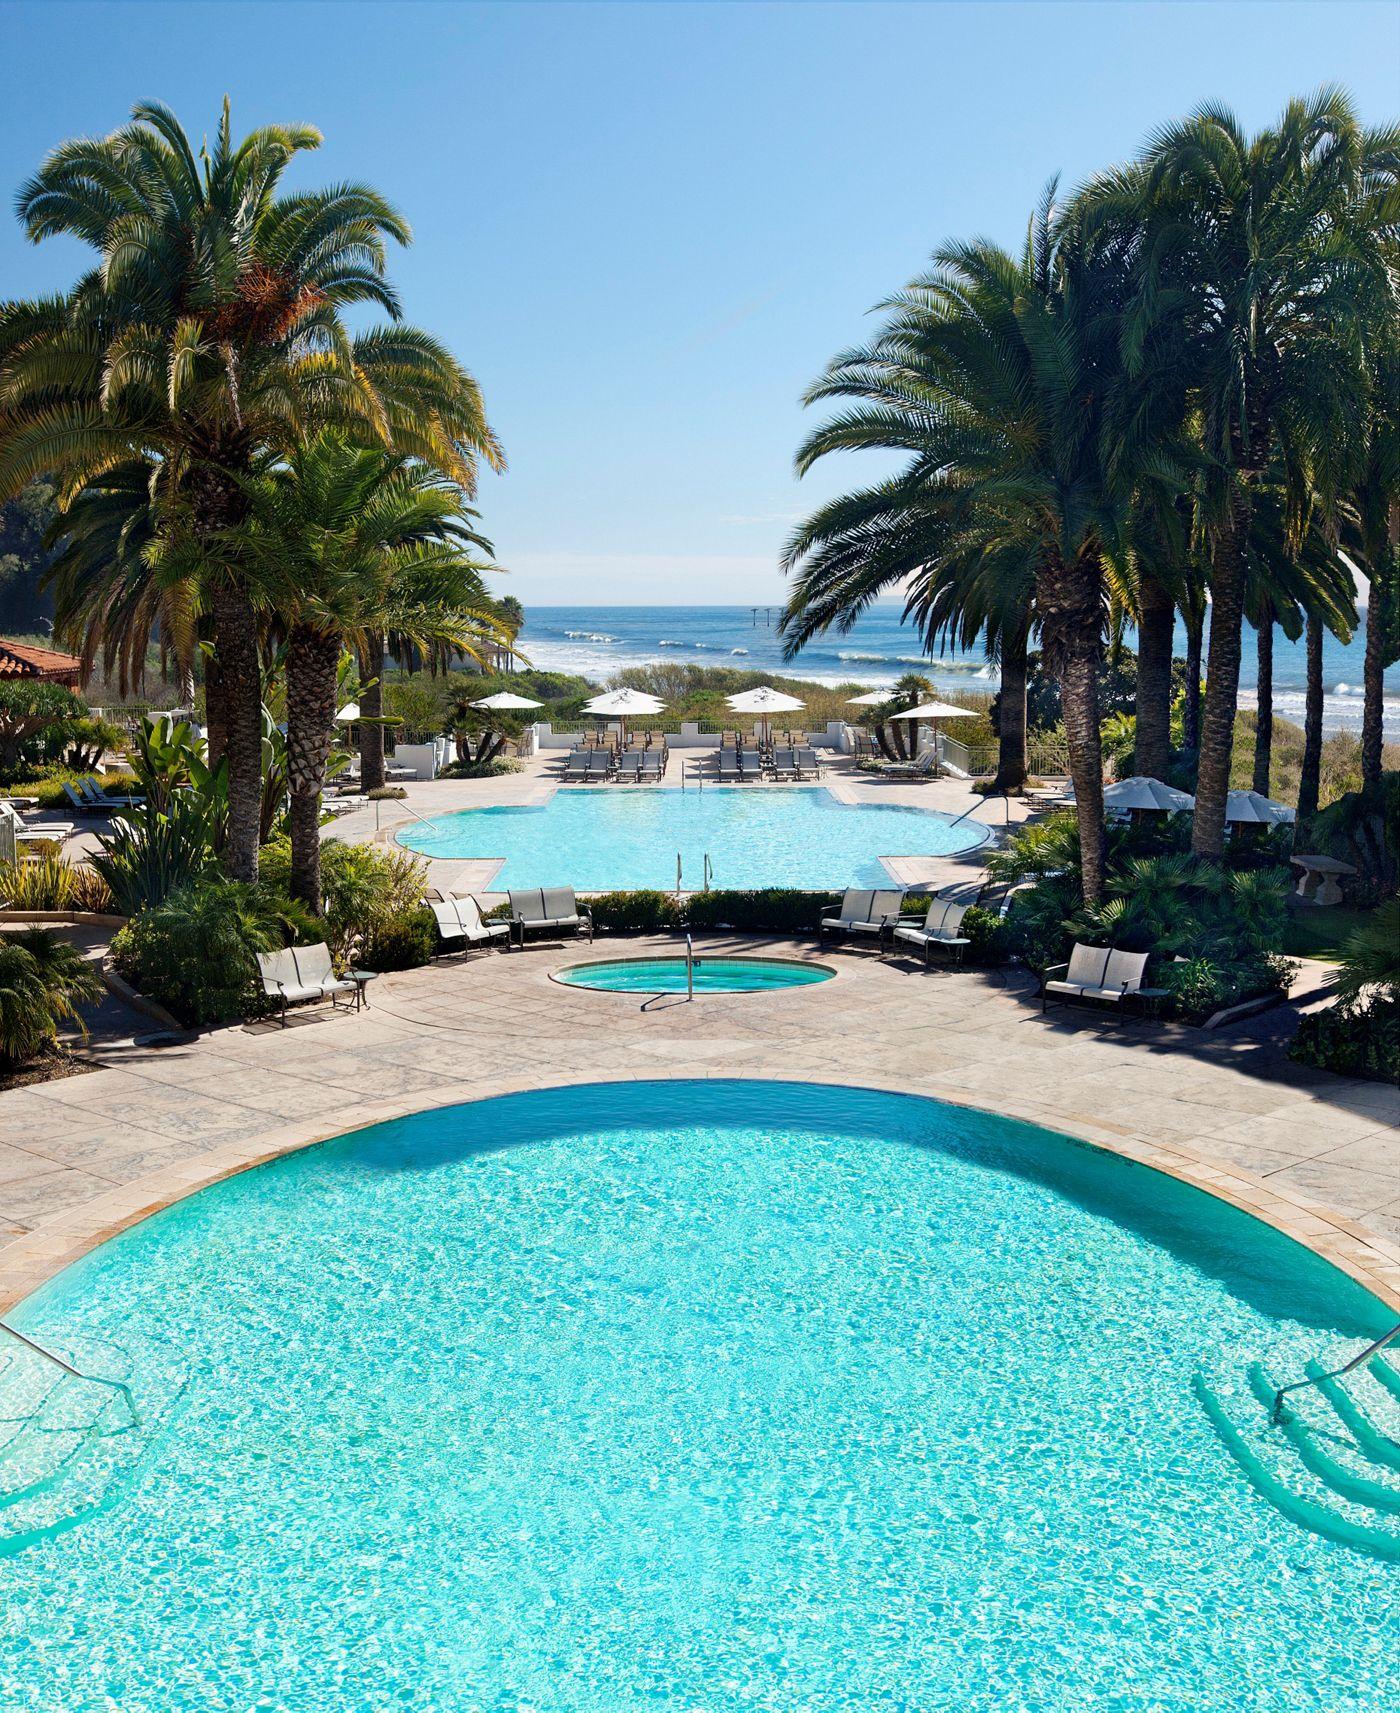 The Ritz-Carlton Bacara Resort I Santa Barbara, CA I 105 miles from West LA -